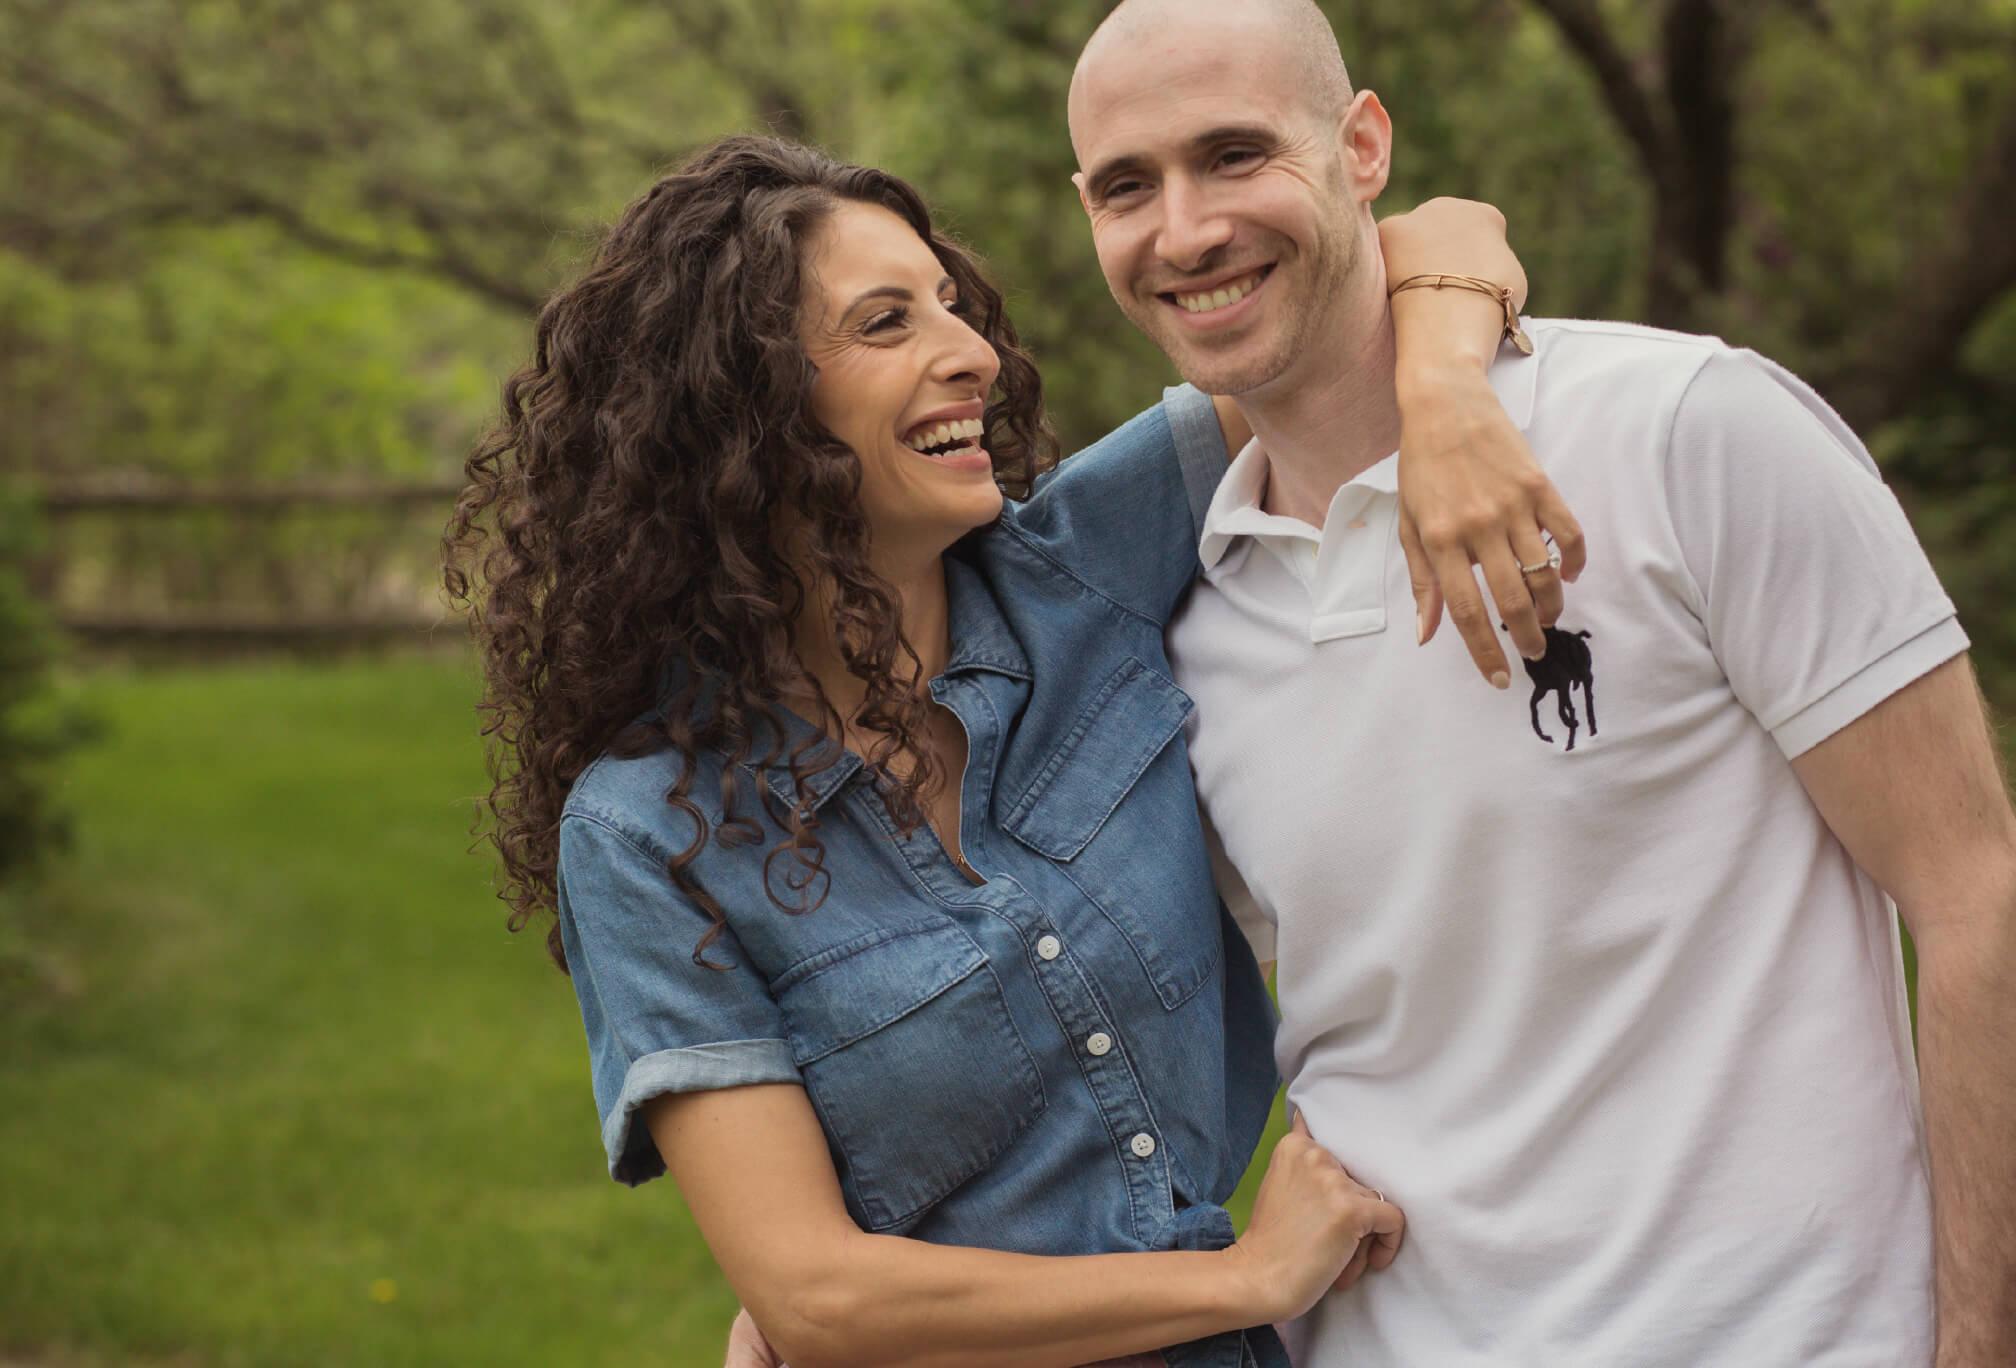 kurtz orchards couples photography